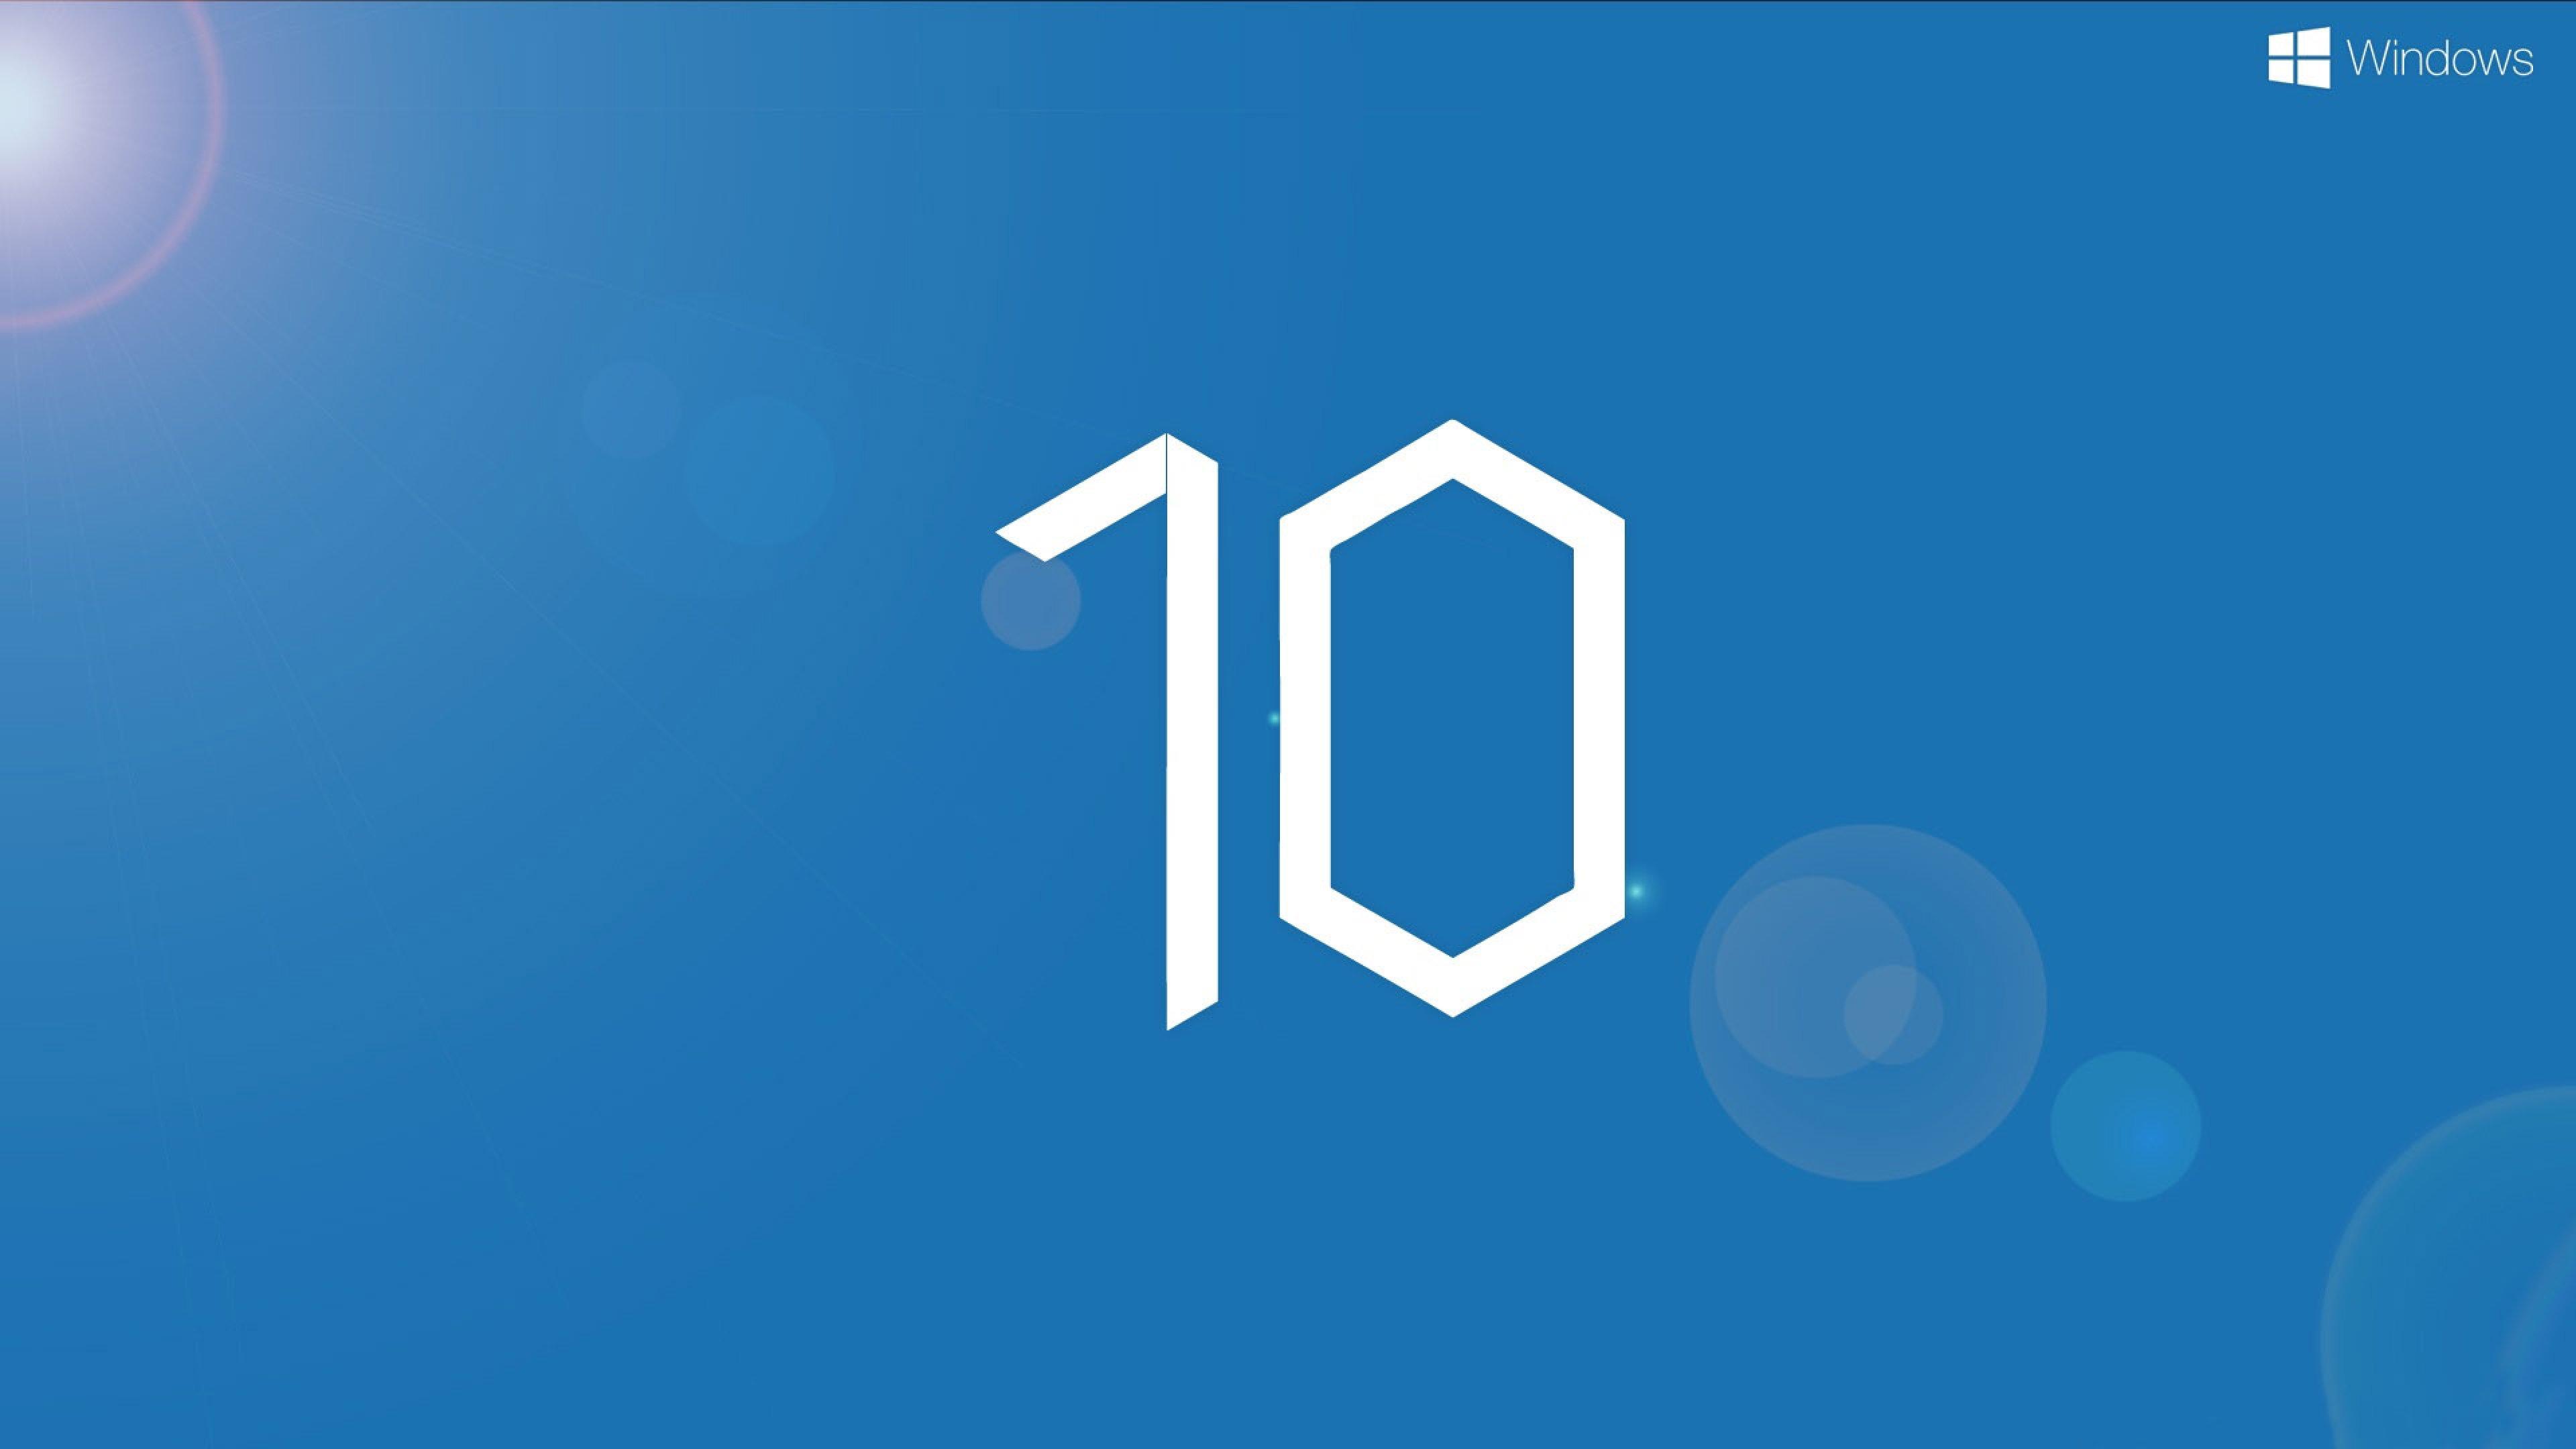 Windows 10 4k Wallpapers 13 Wallpaper 3840x2160 1035147